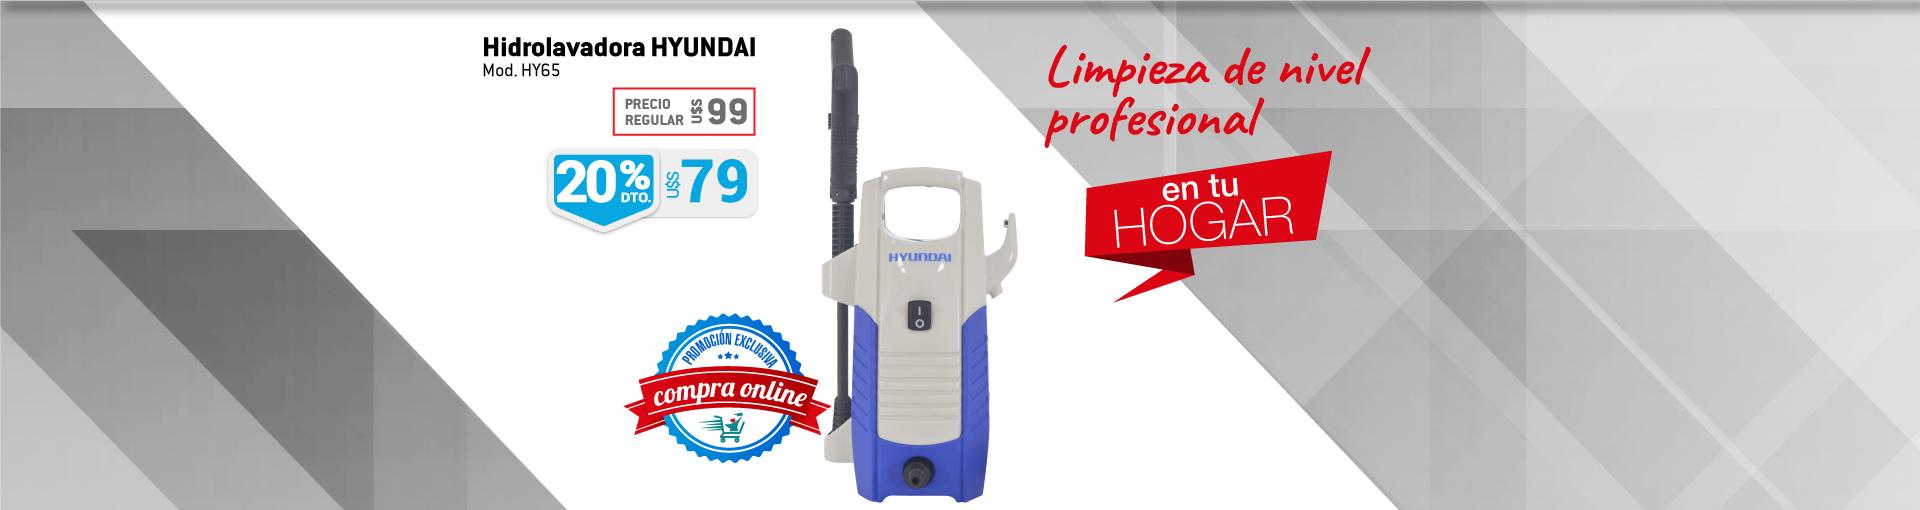 h-605683-hidrolavadora-hyundai